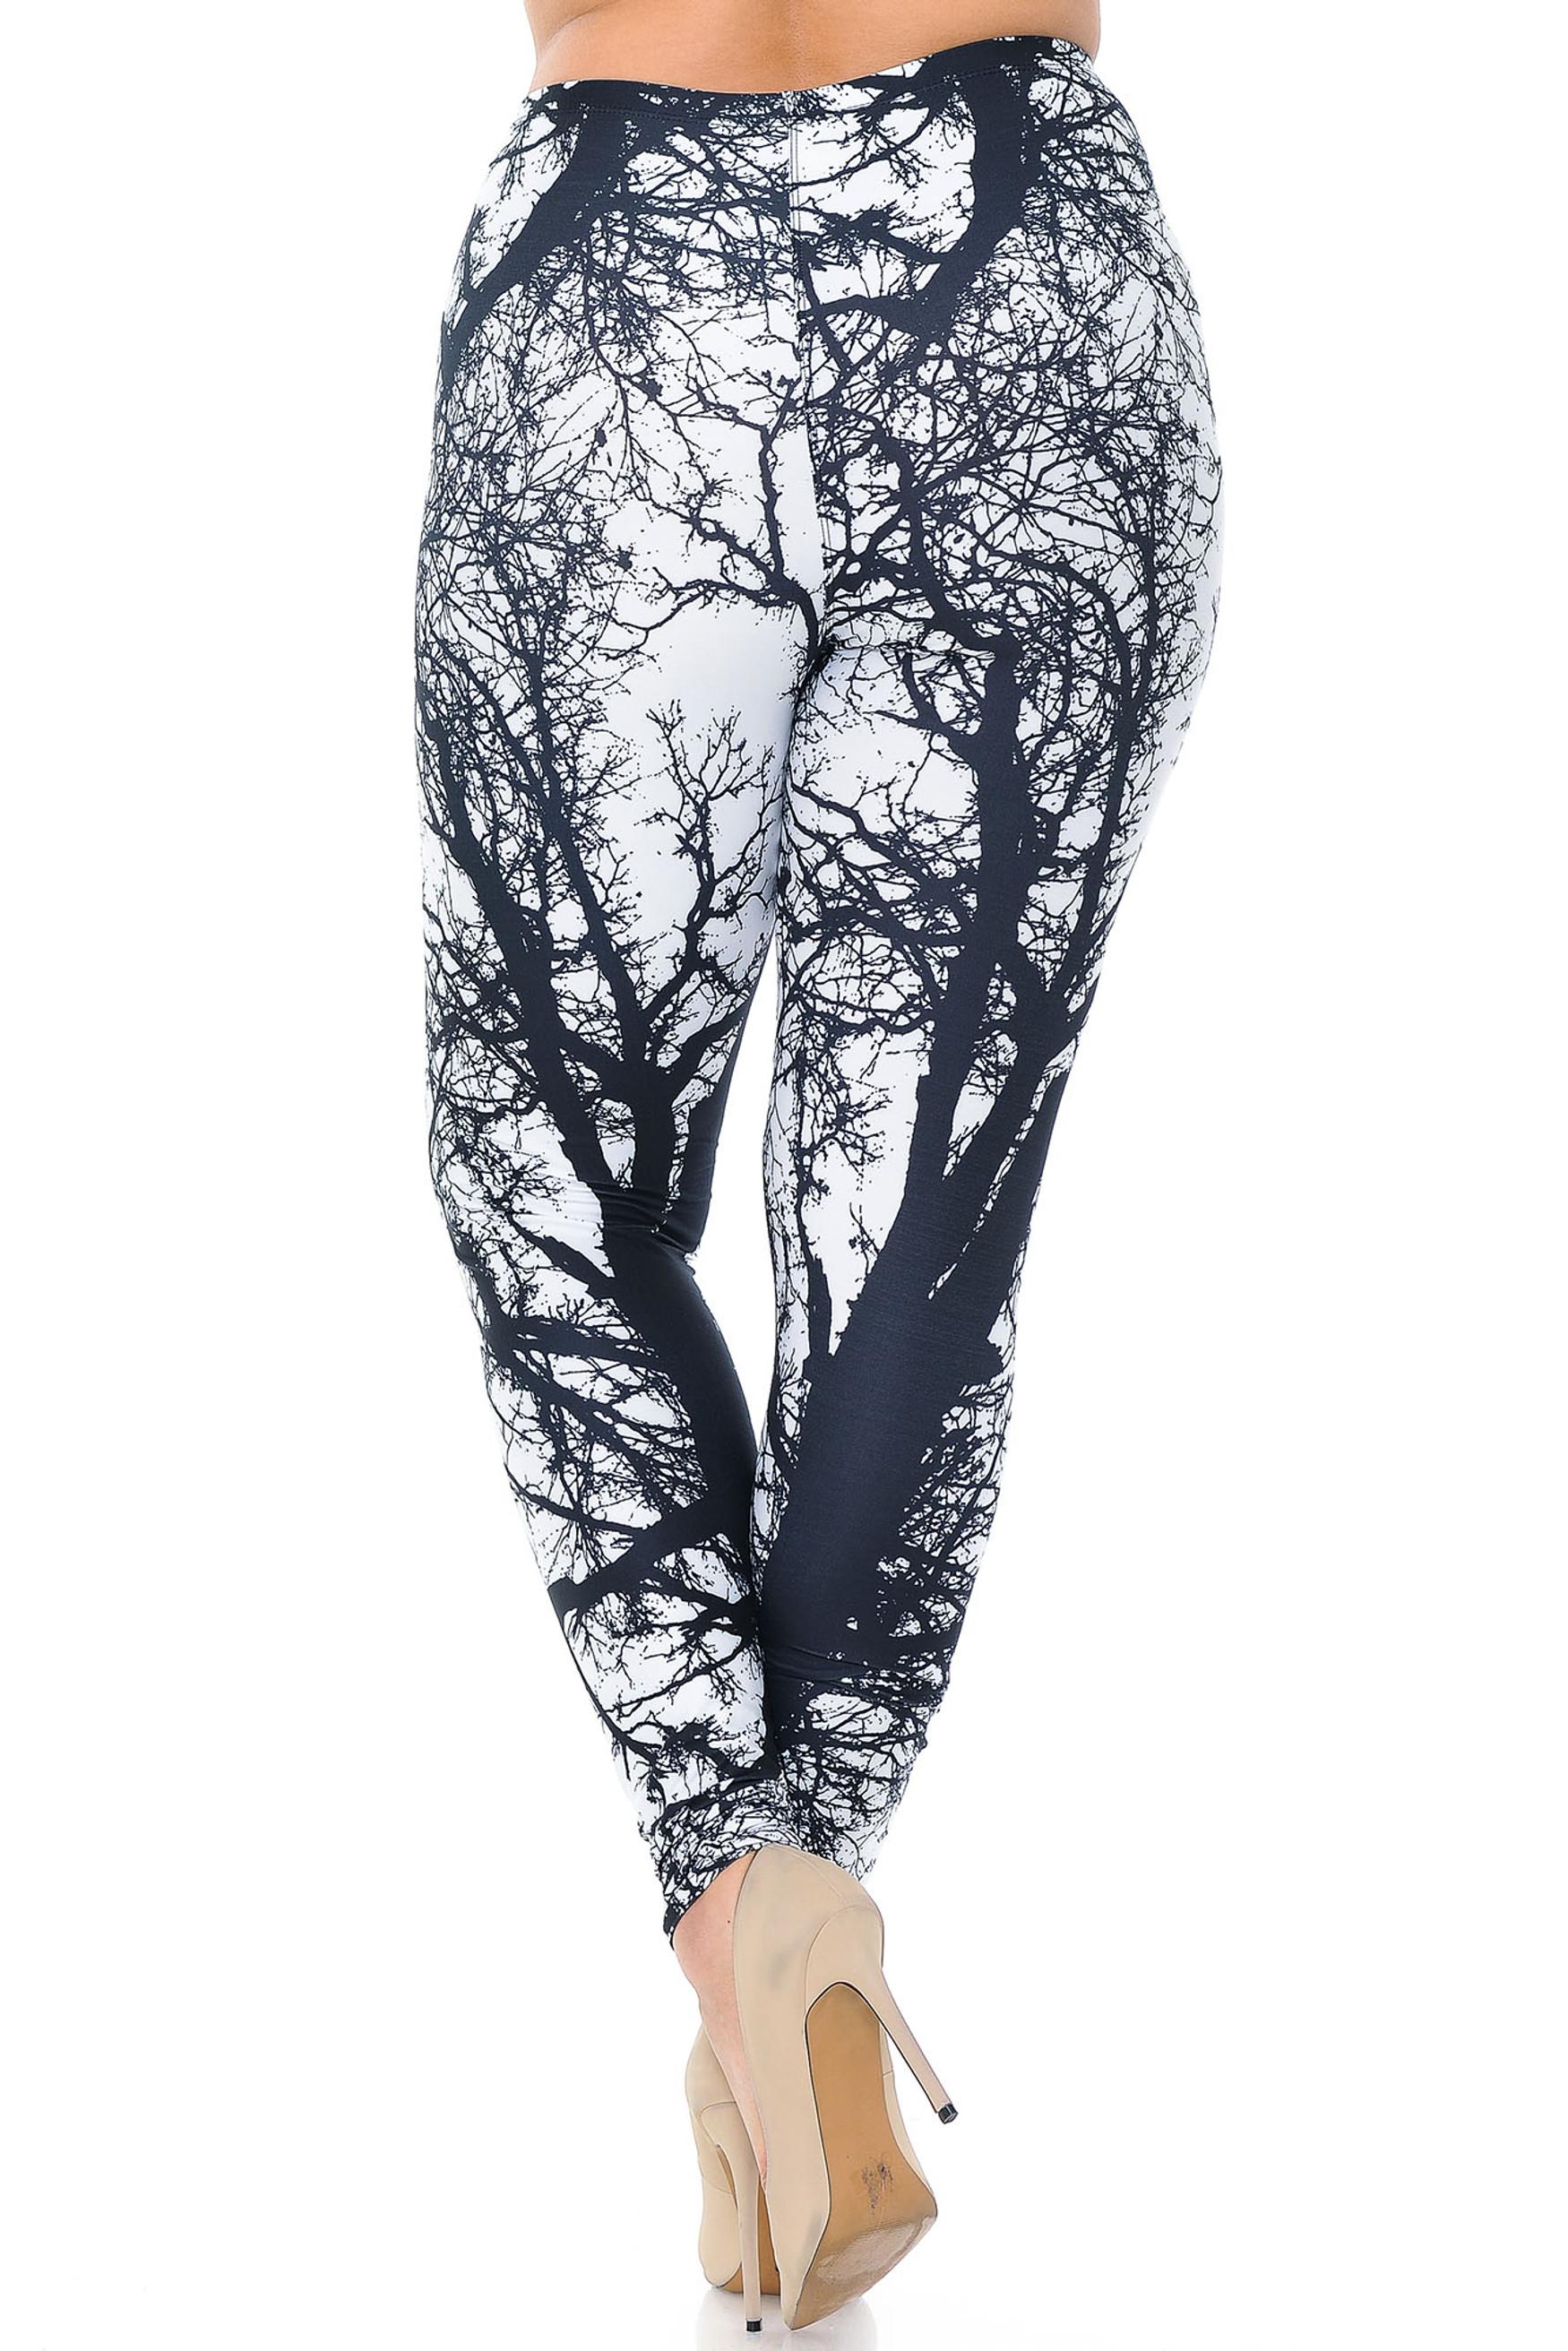 Creamy Soft Photo Negative Tree Plus Size Leggings - USA Fashion™